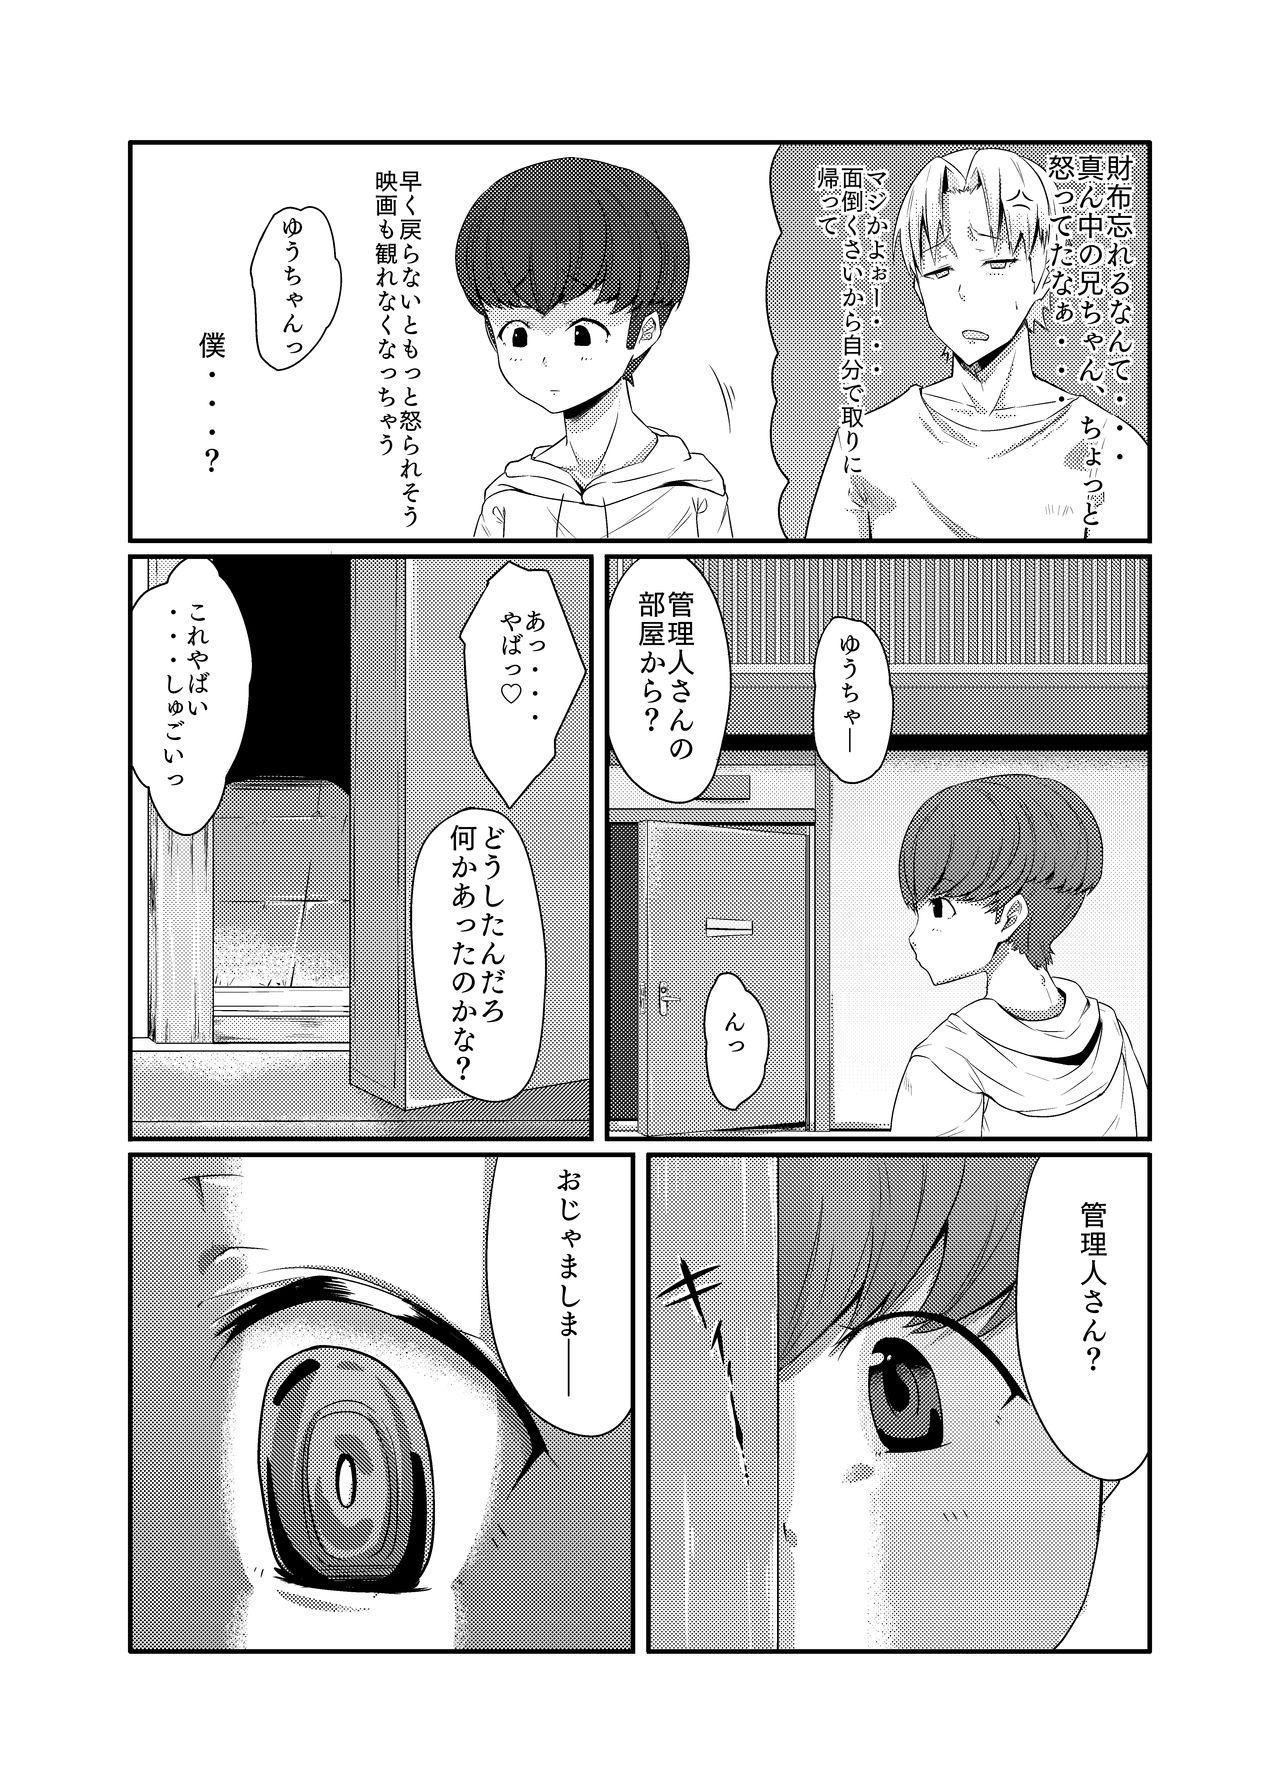 Kanrinin-san wa Mirareta!! 10